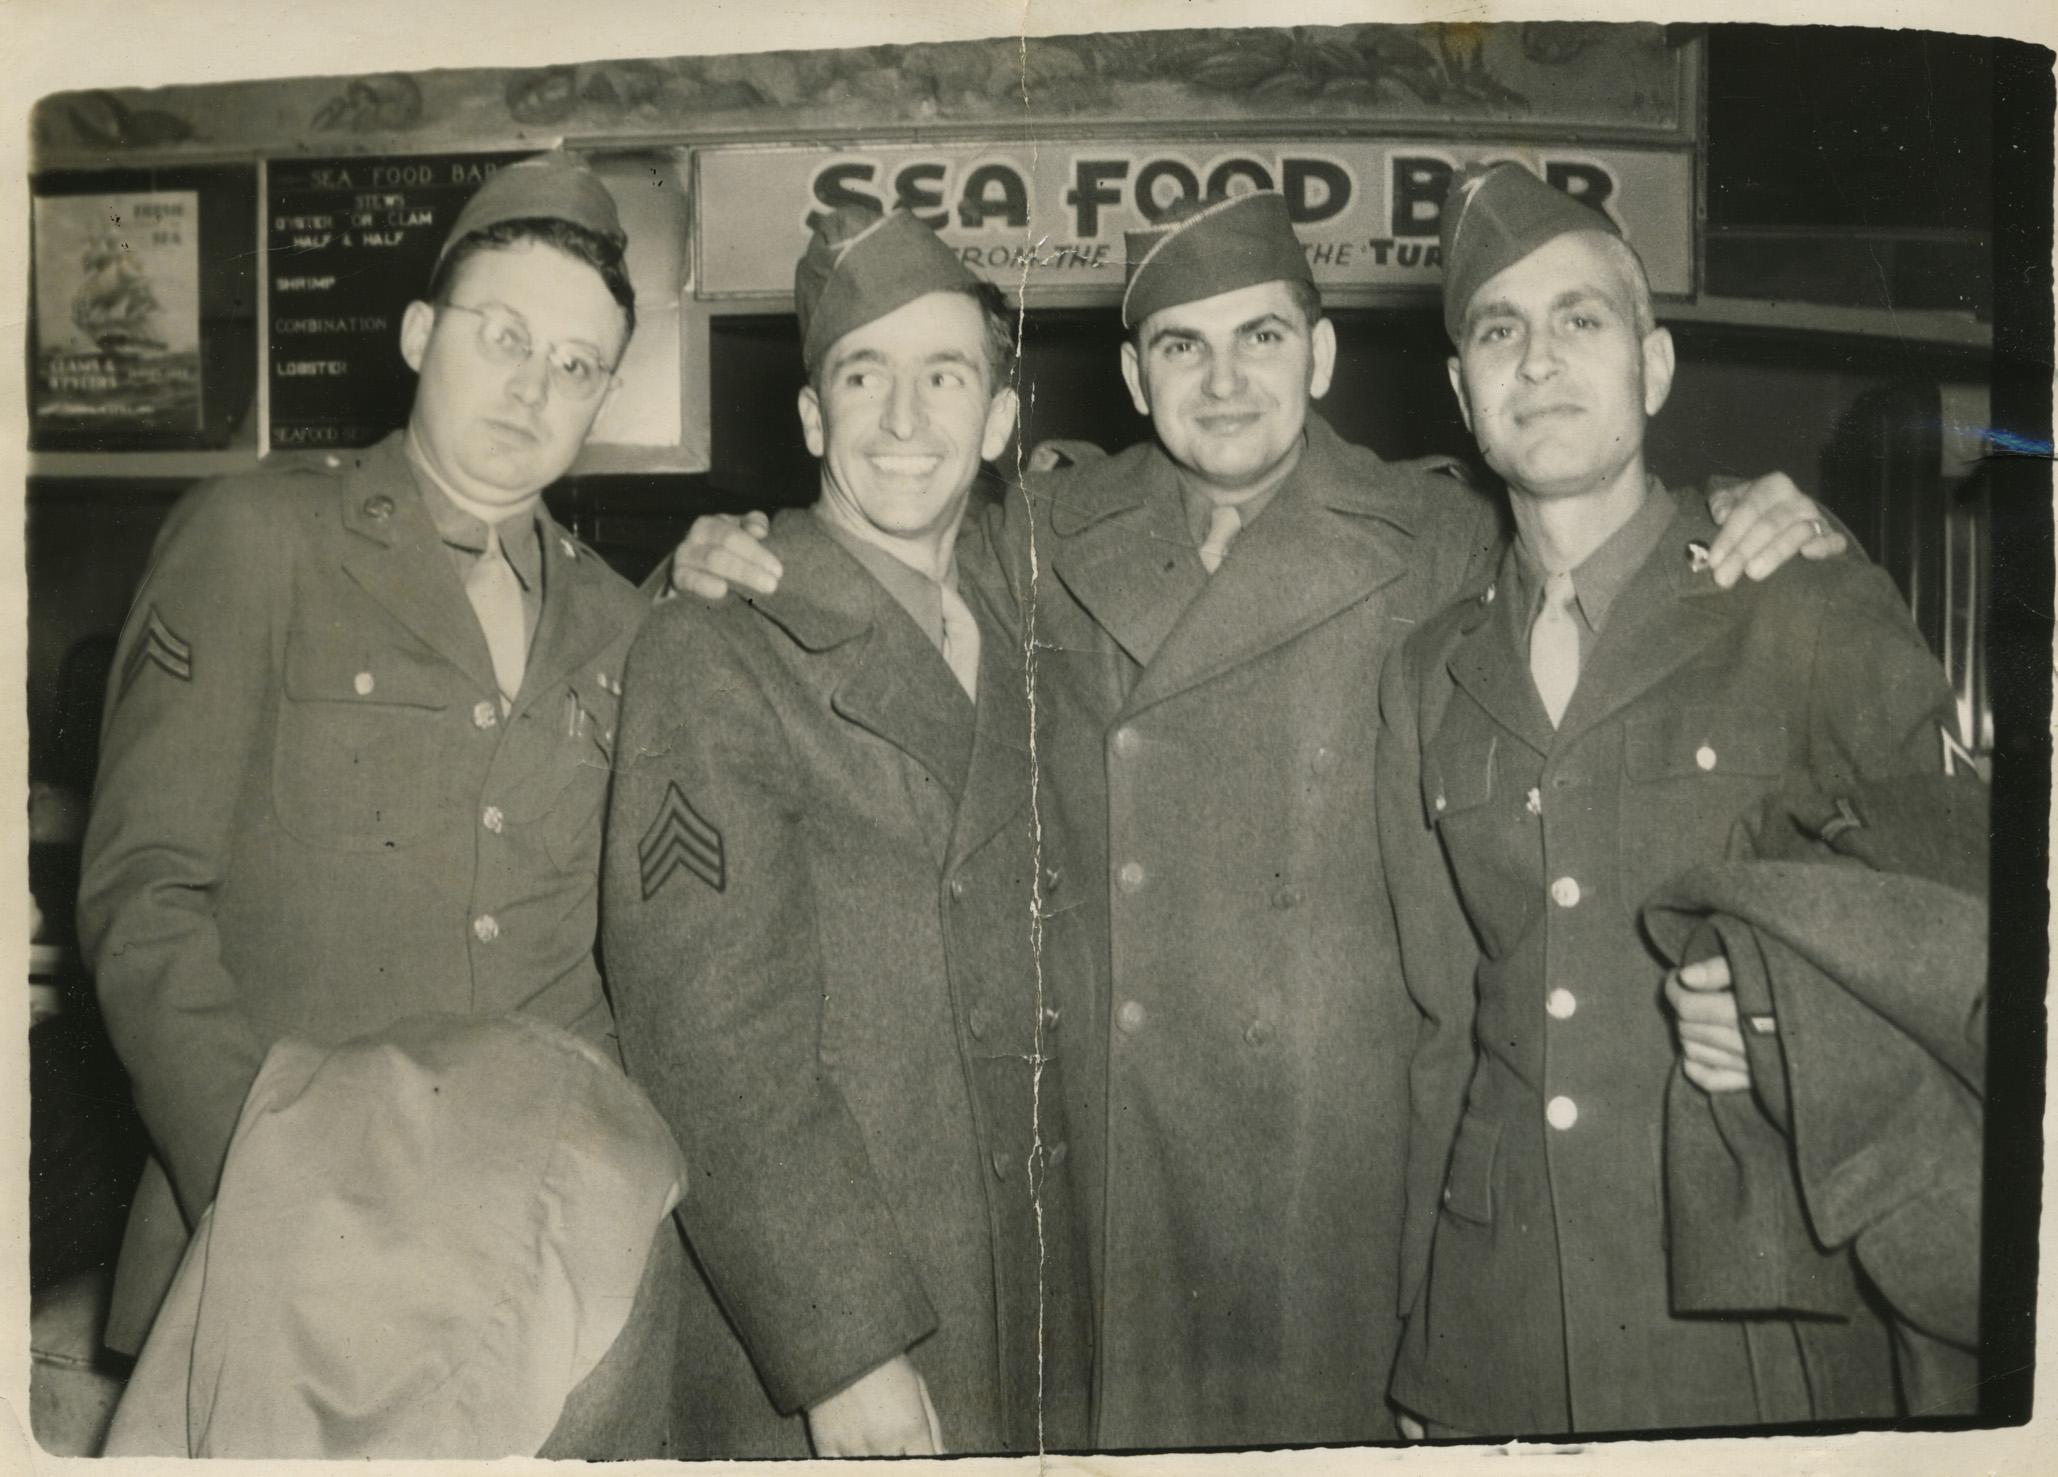 sea food bar clarence and army buds.jpg